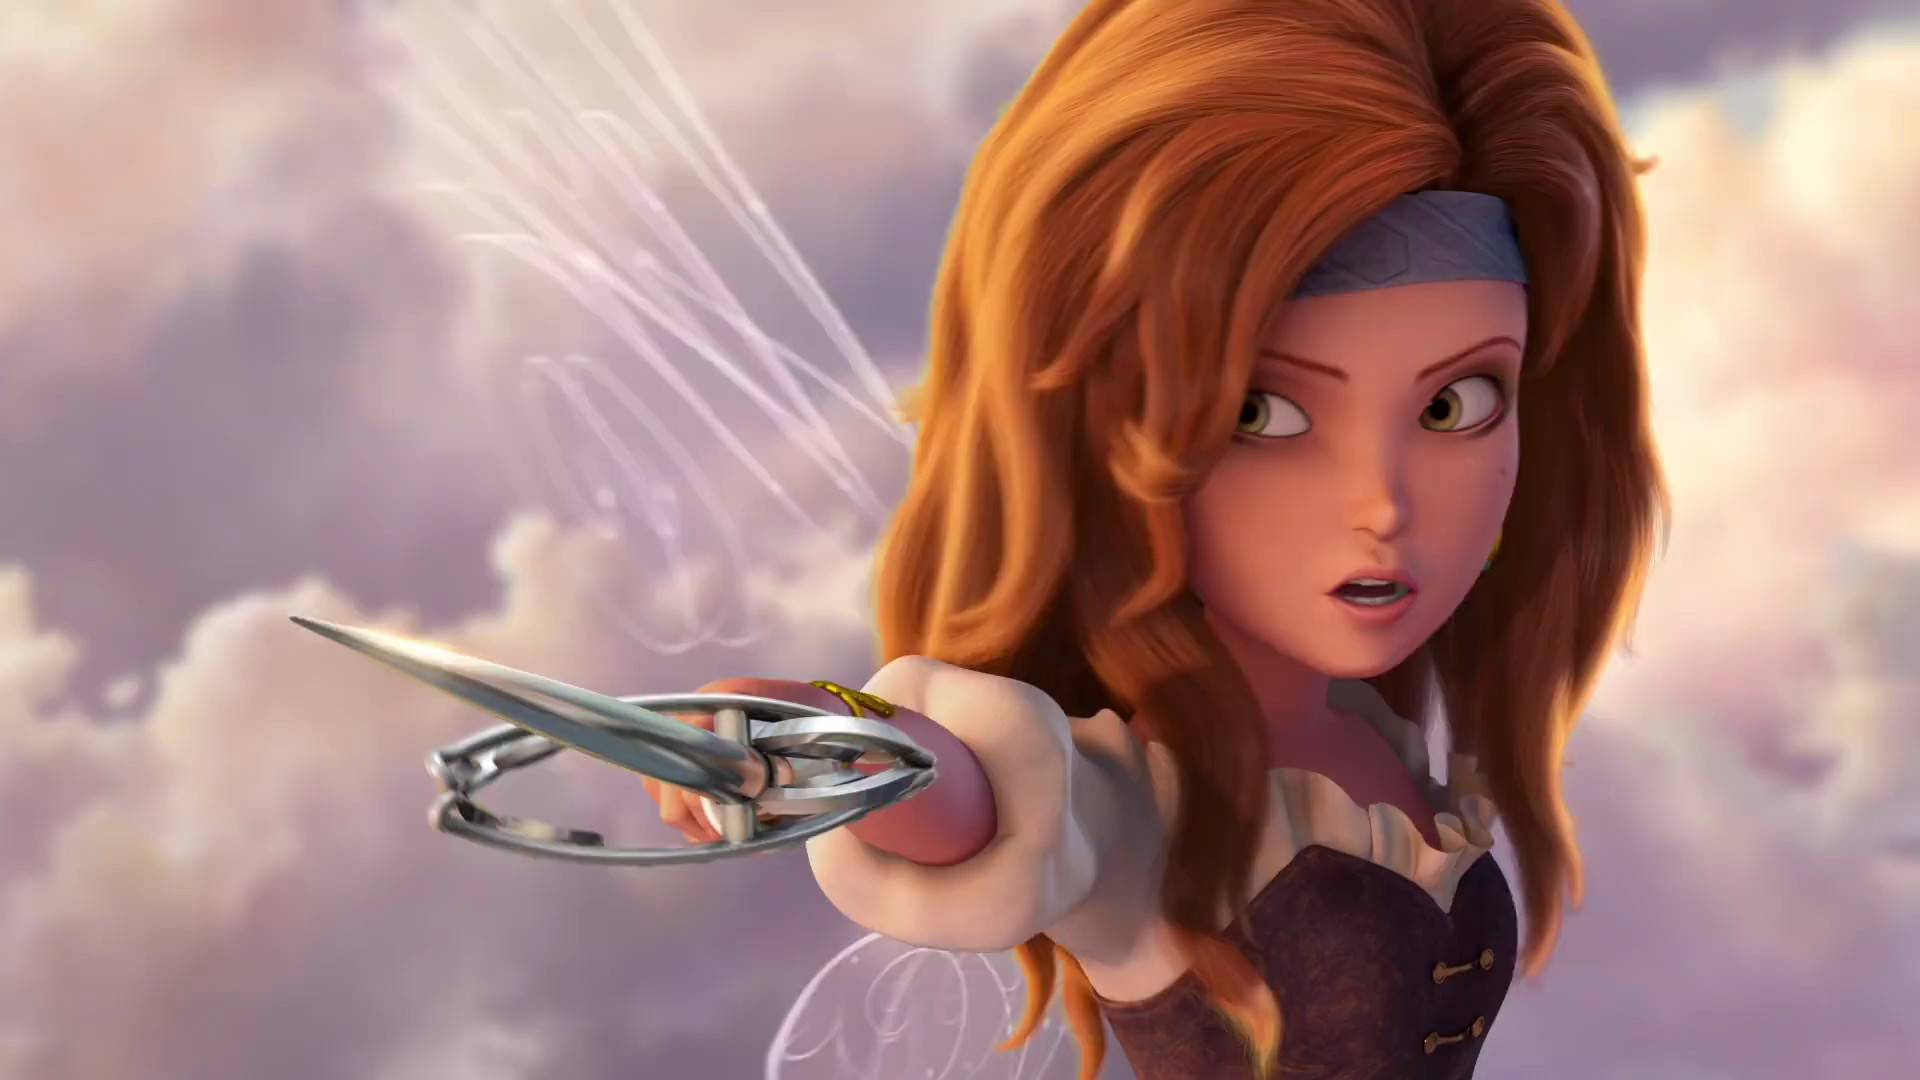 tinkerbell and the pirate fairy meet zarina